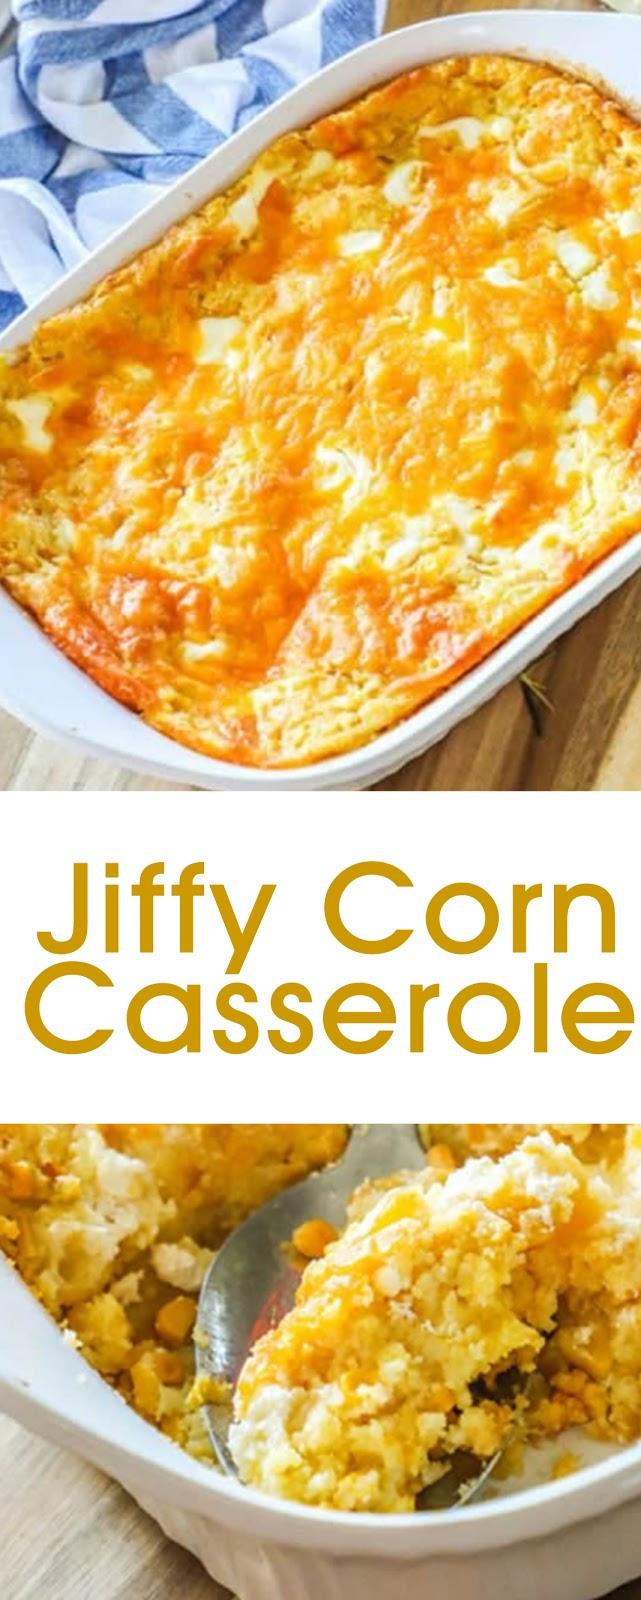 Jiffy Corn Casserole #casserole